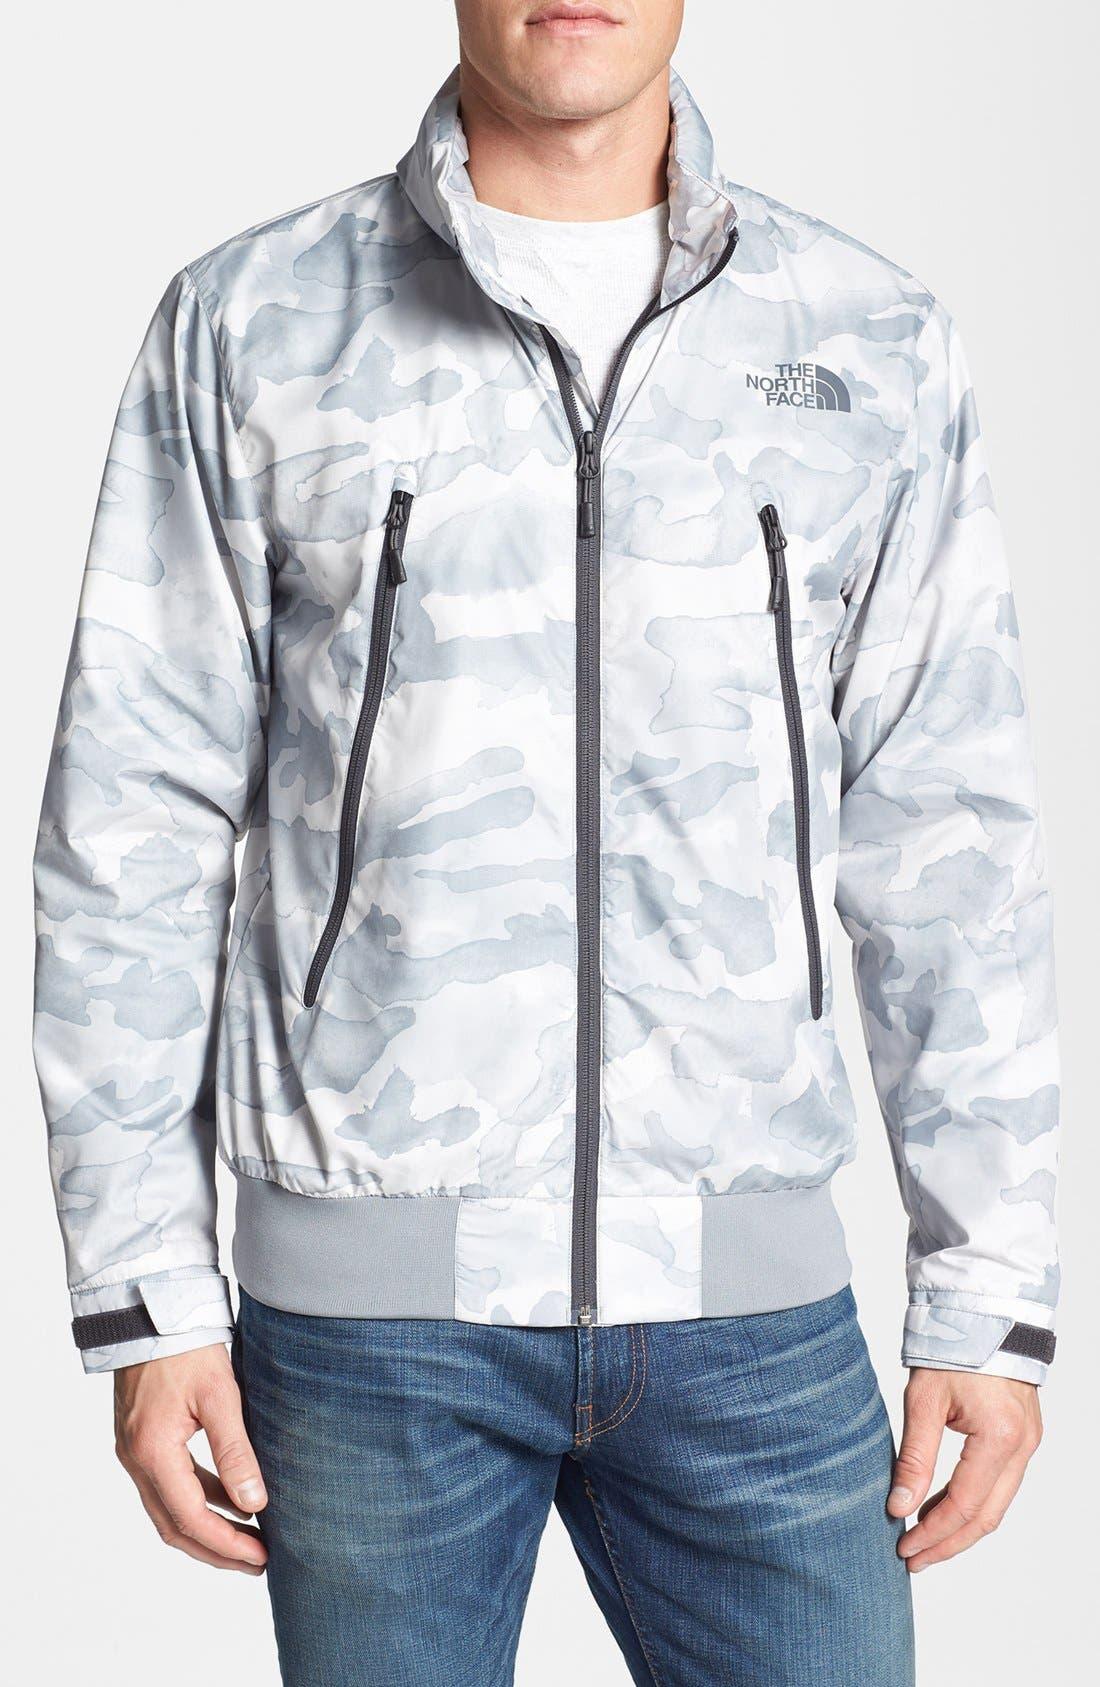 Alternate Image 1 Selected - The North Face 'Diablo' Windbreaker Jacket